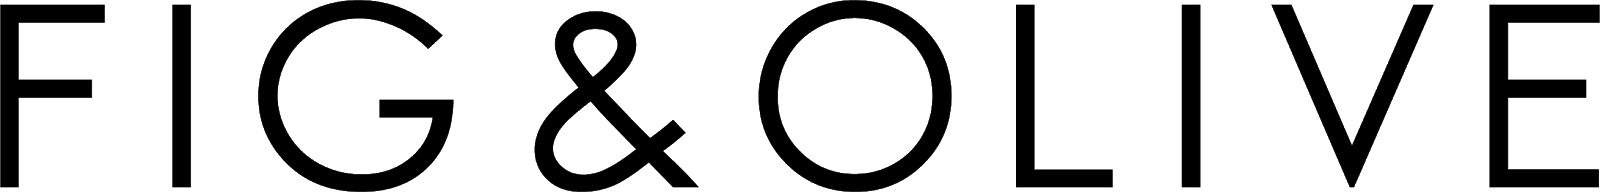 https://images.getbento.com/J41PQCgsQ2iCcTdaqQyt_FO_Logotype_BLK.png